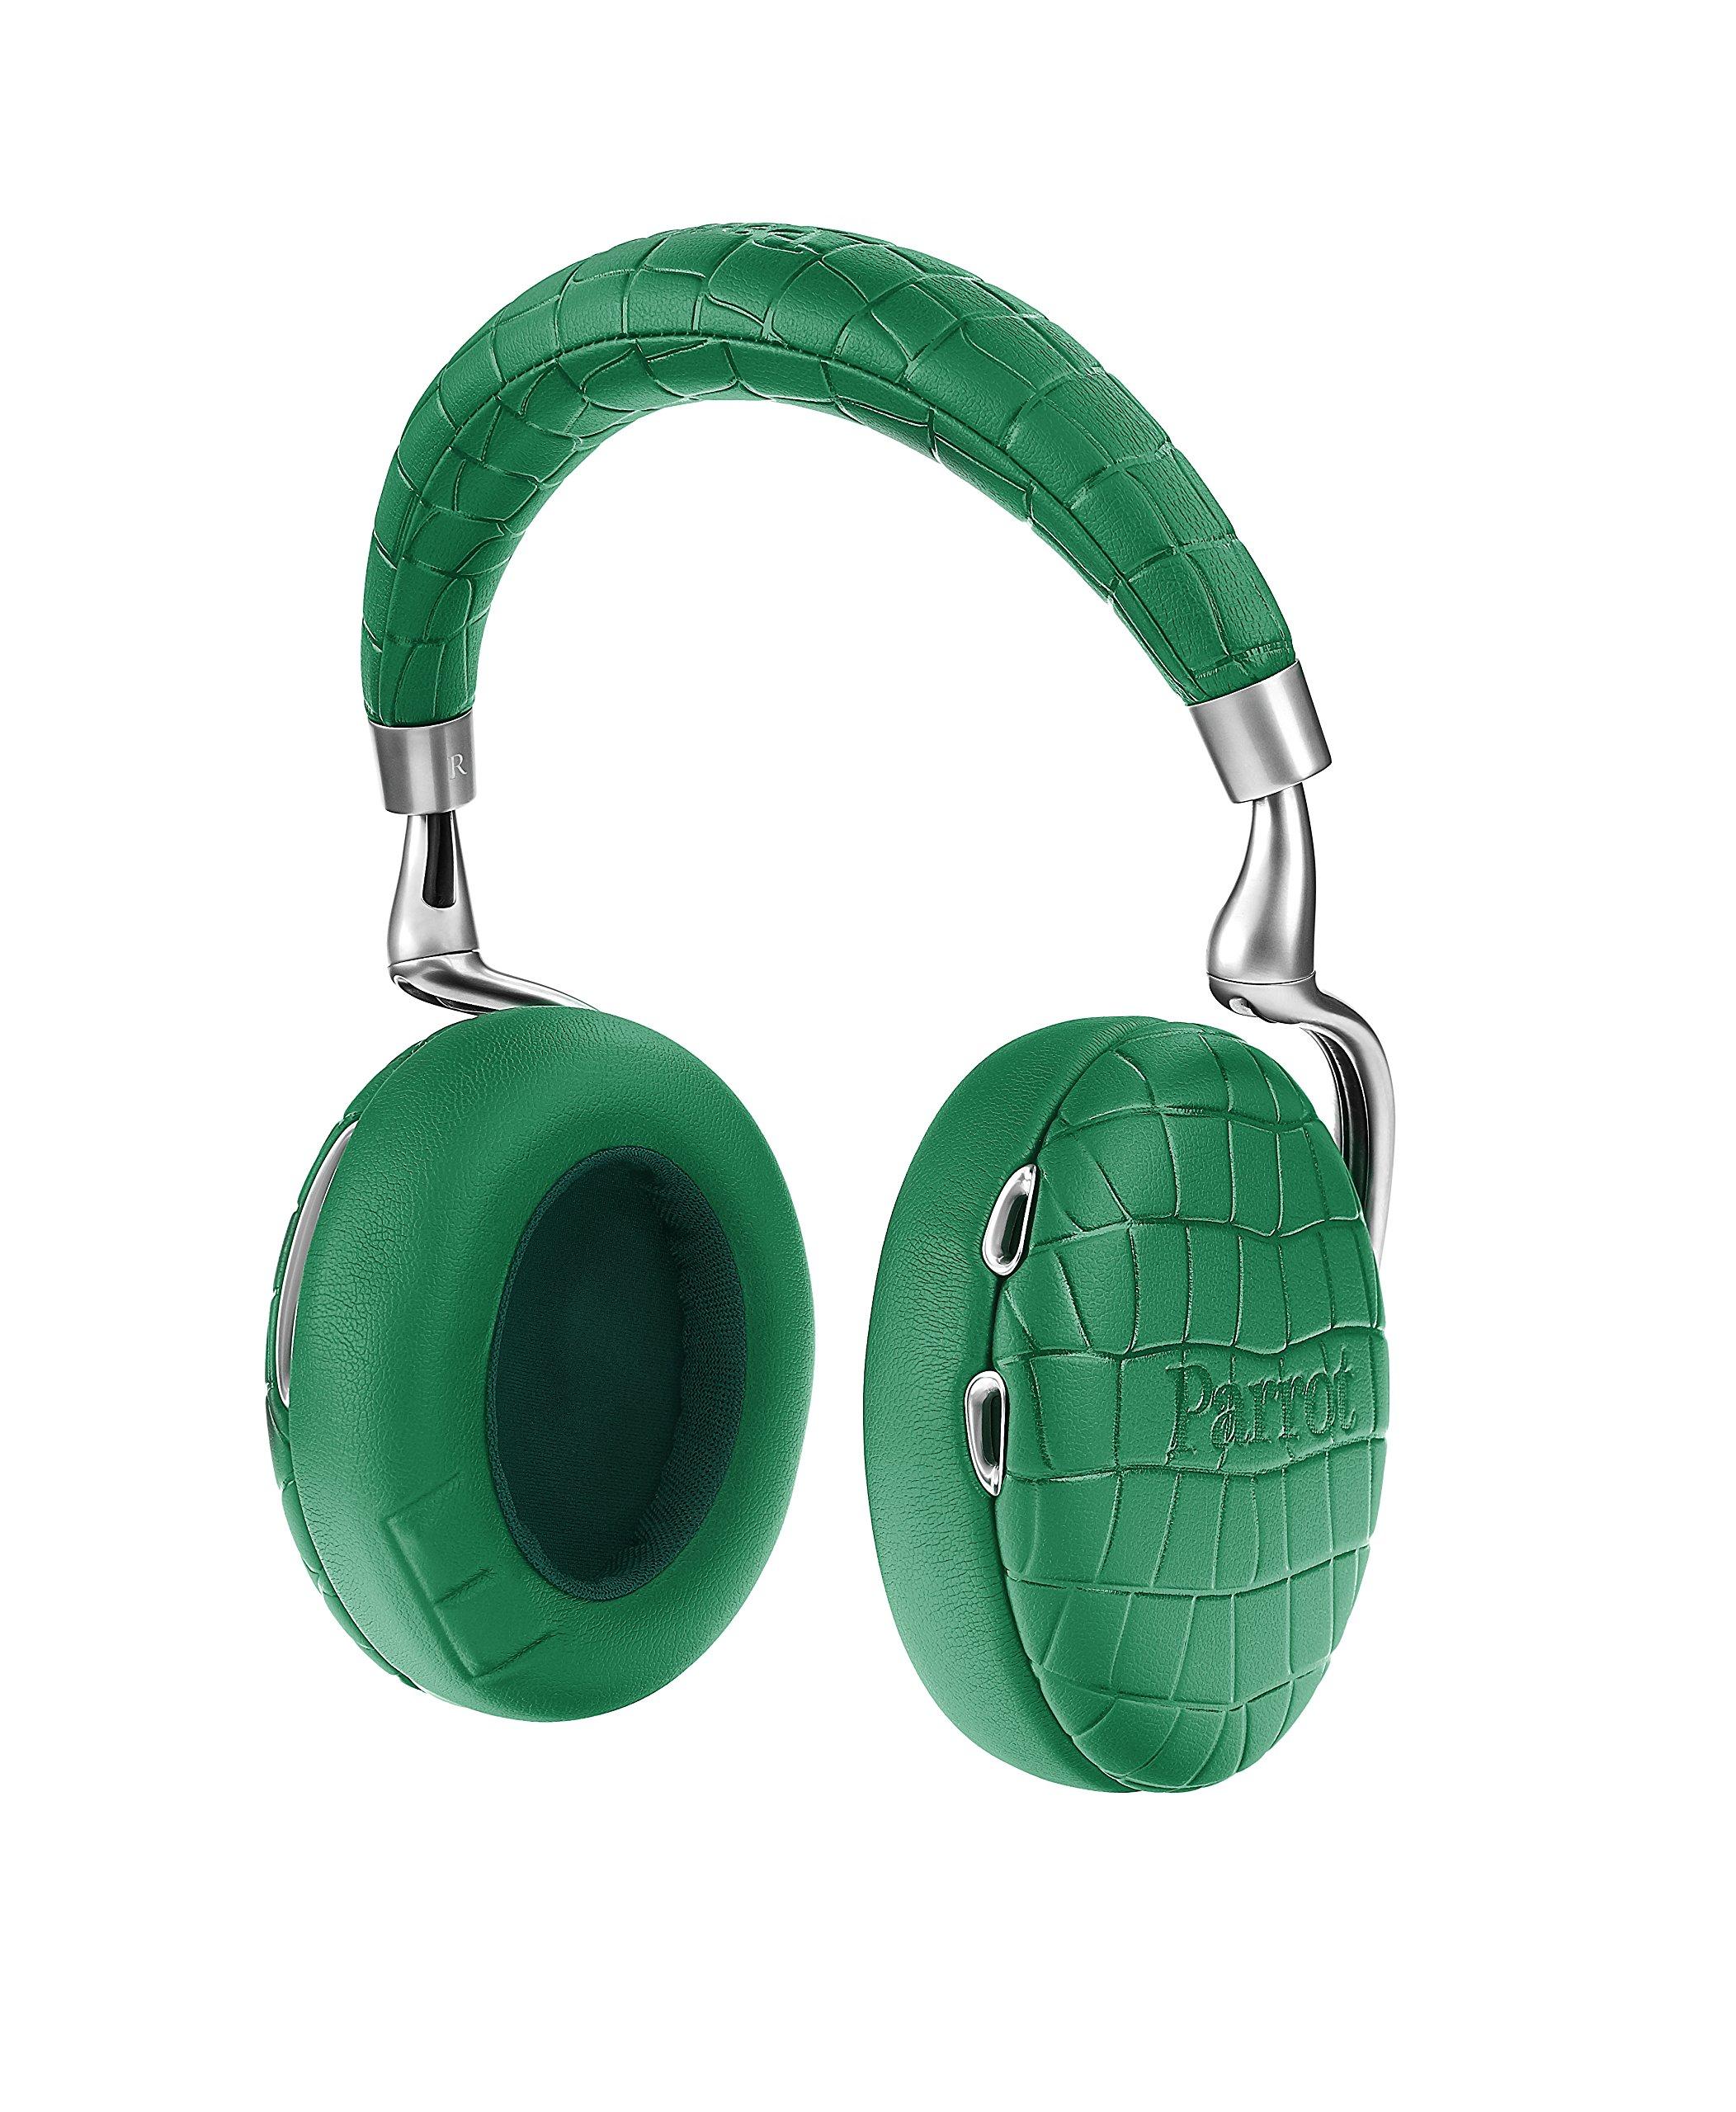 Parrot Zik 3 - Auriculares inalámbricos, cargador inalámbrico ...